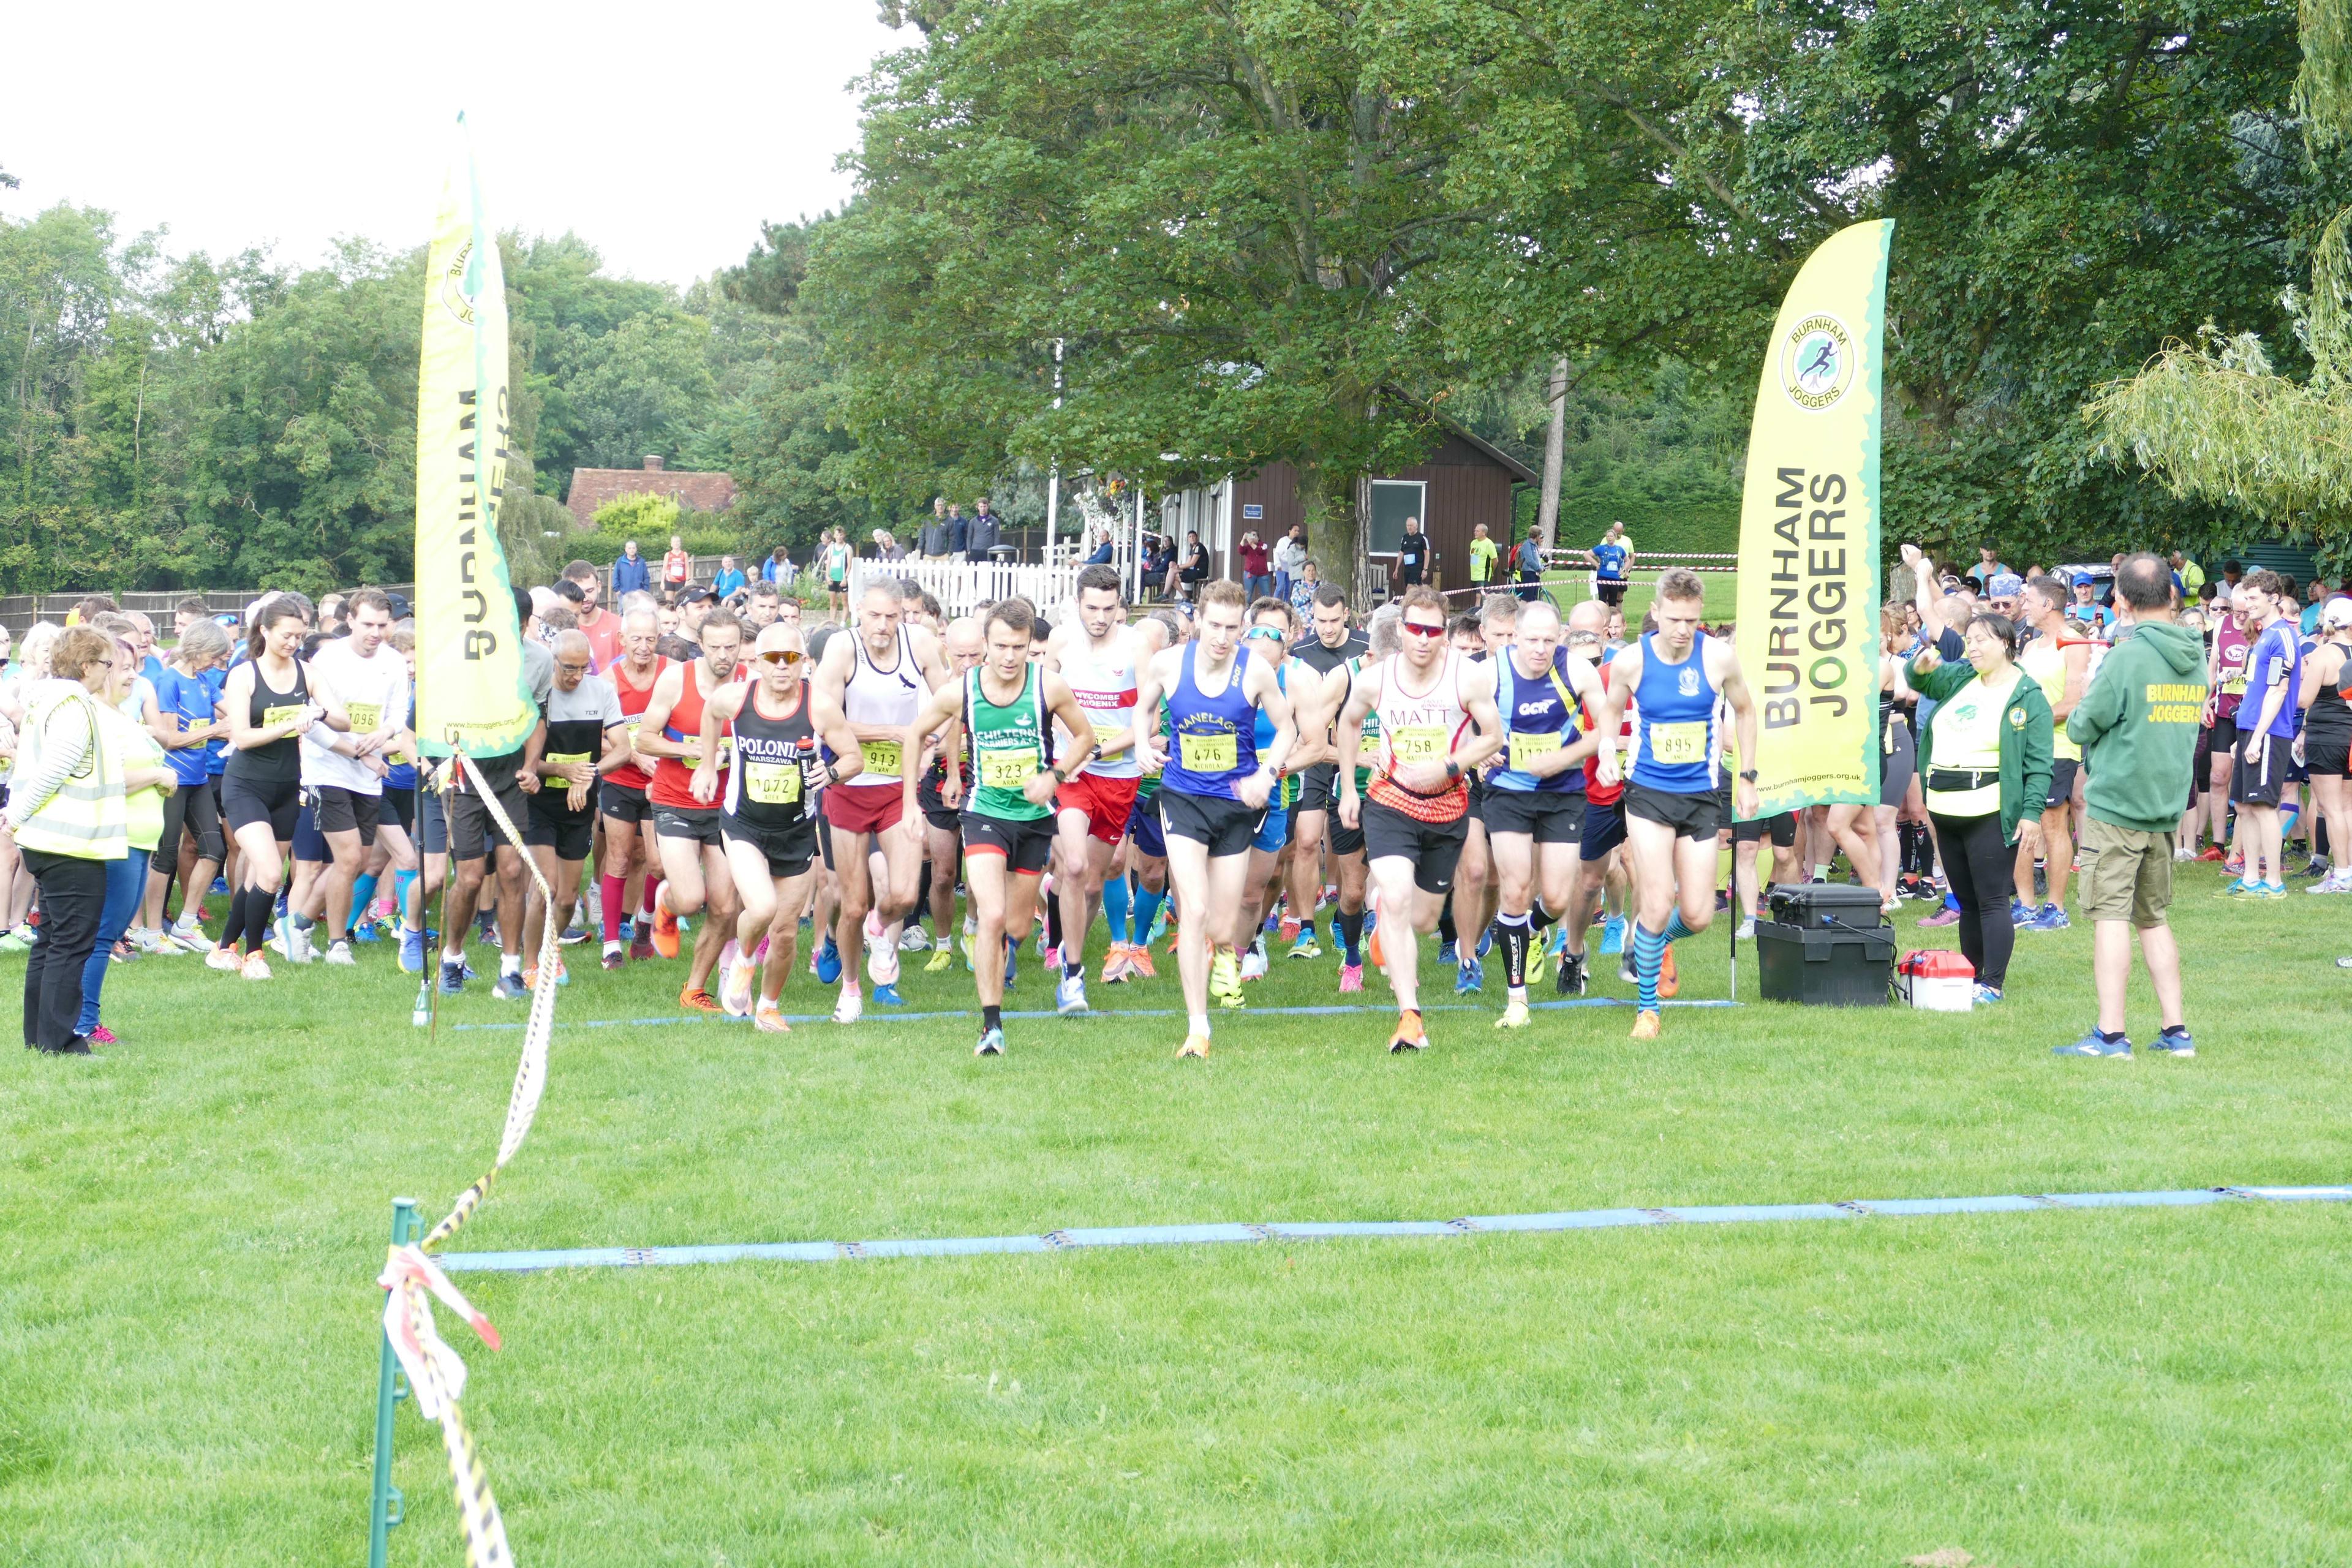 Burnham Beeches Half Marathon and 10k